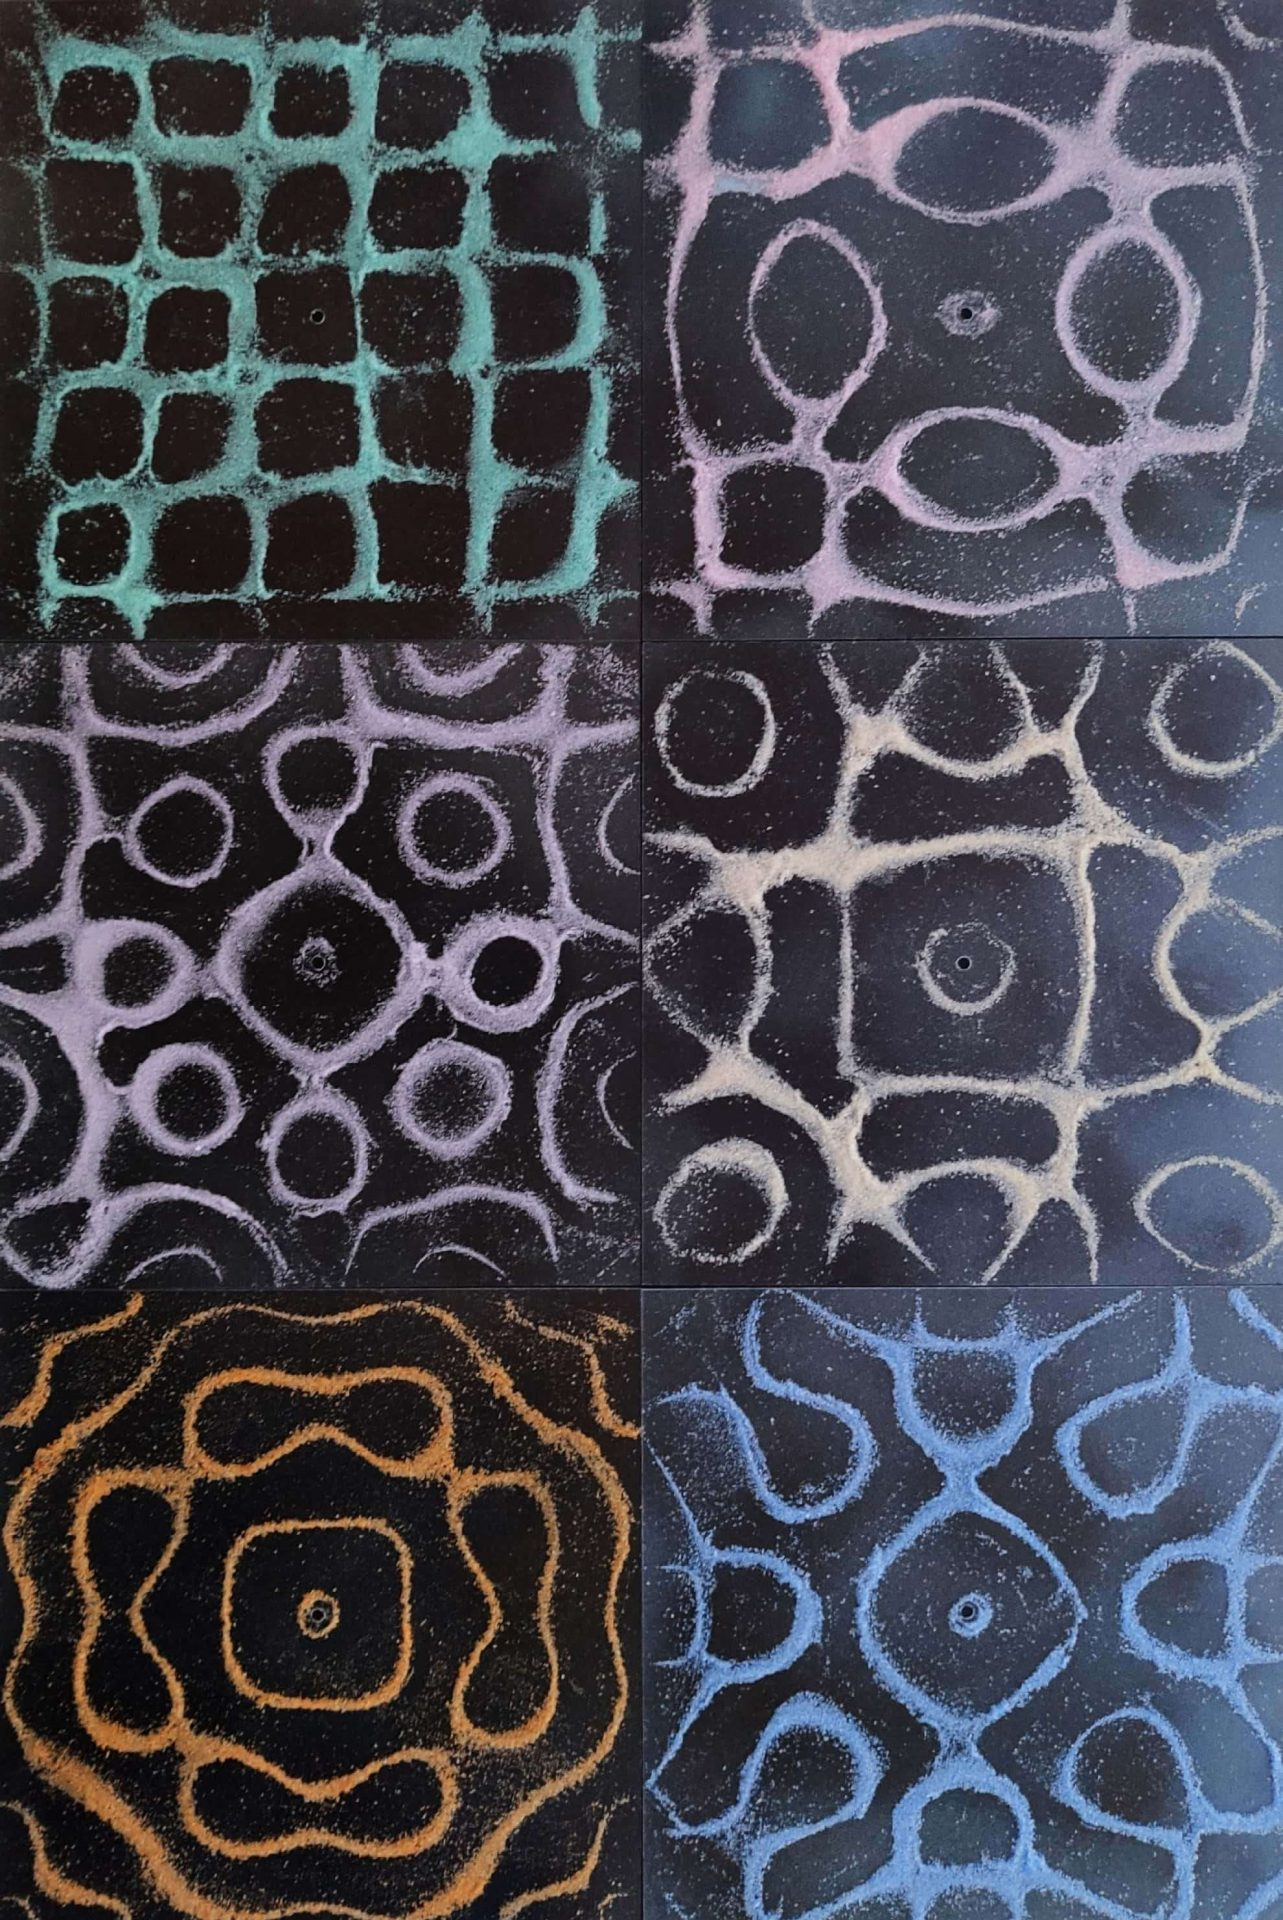 Textures matter sound - Elena F